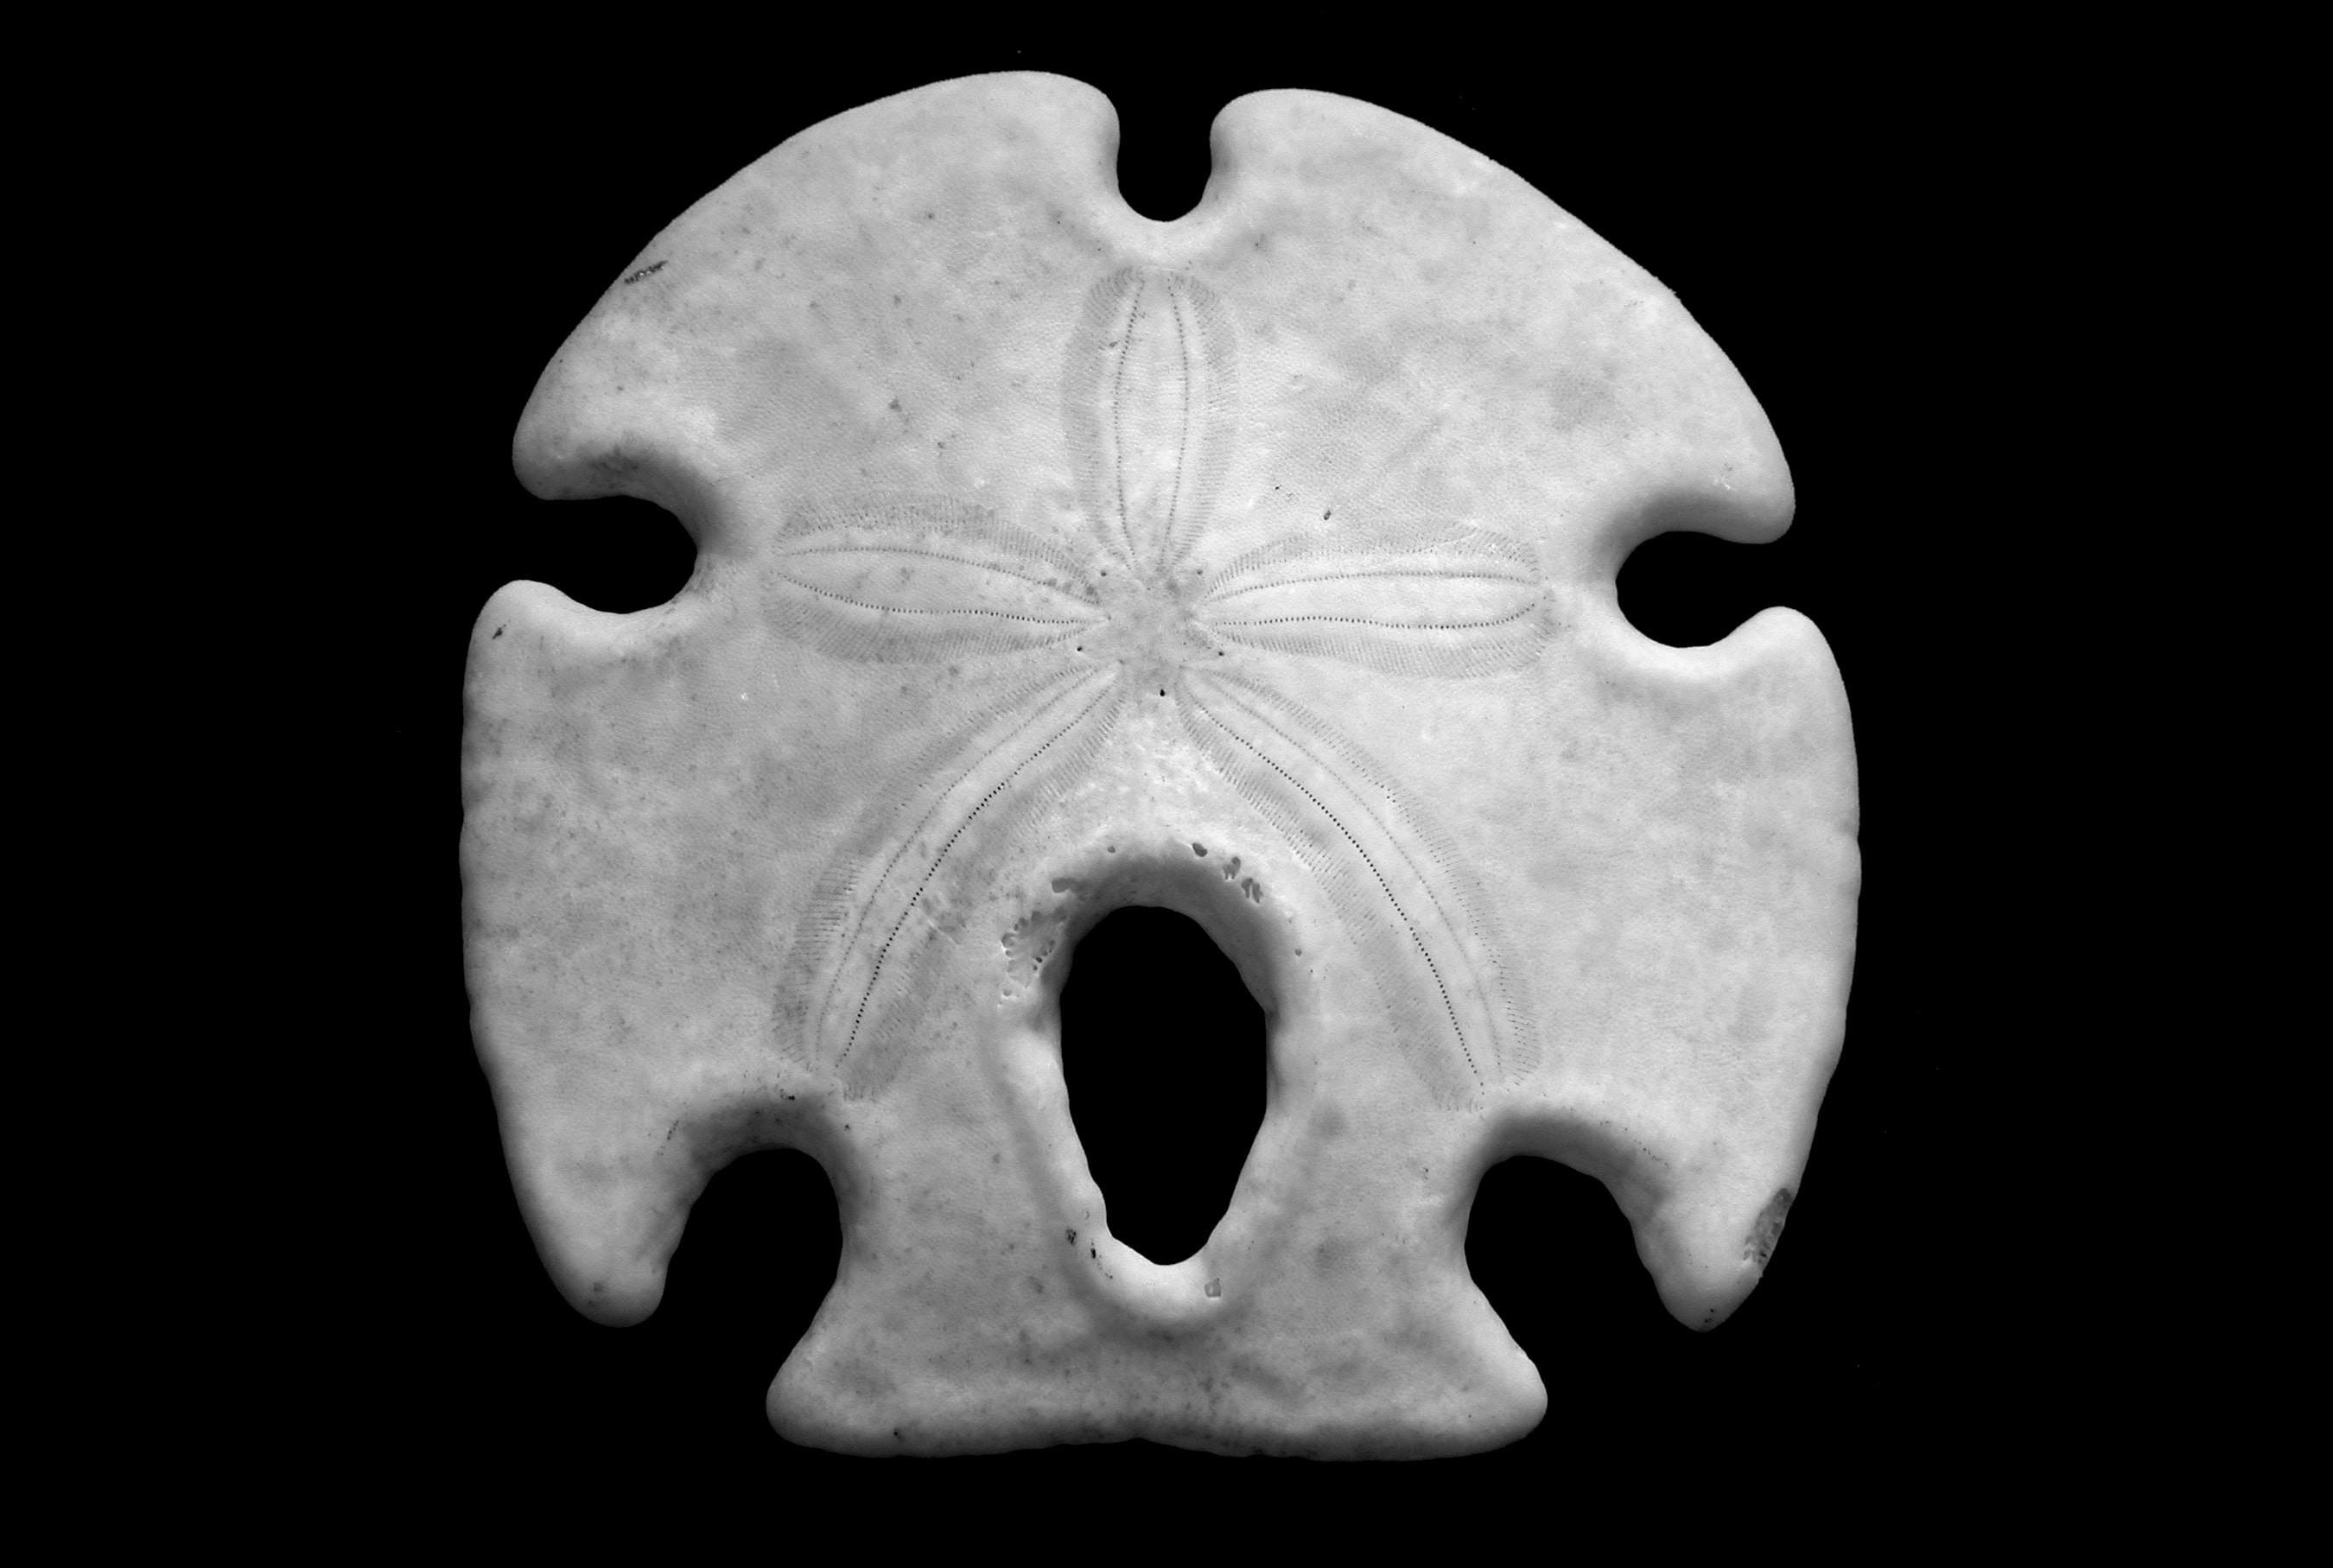 closeup photography of white stone